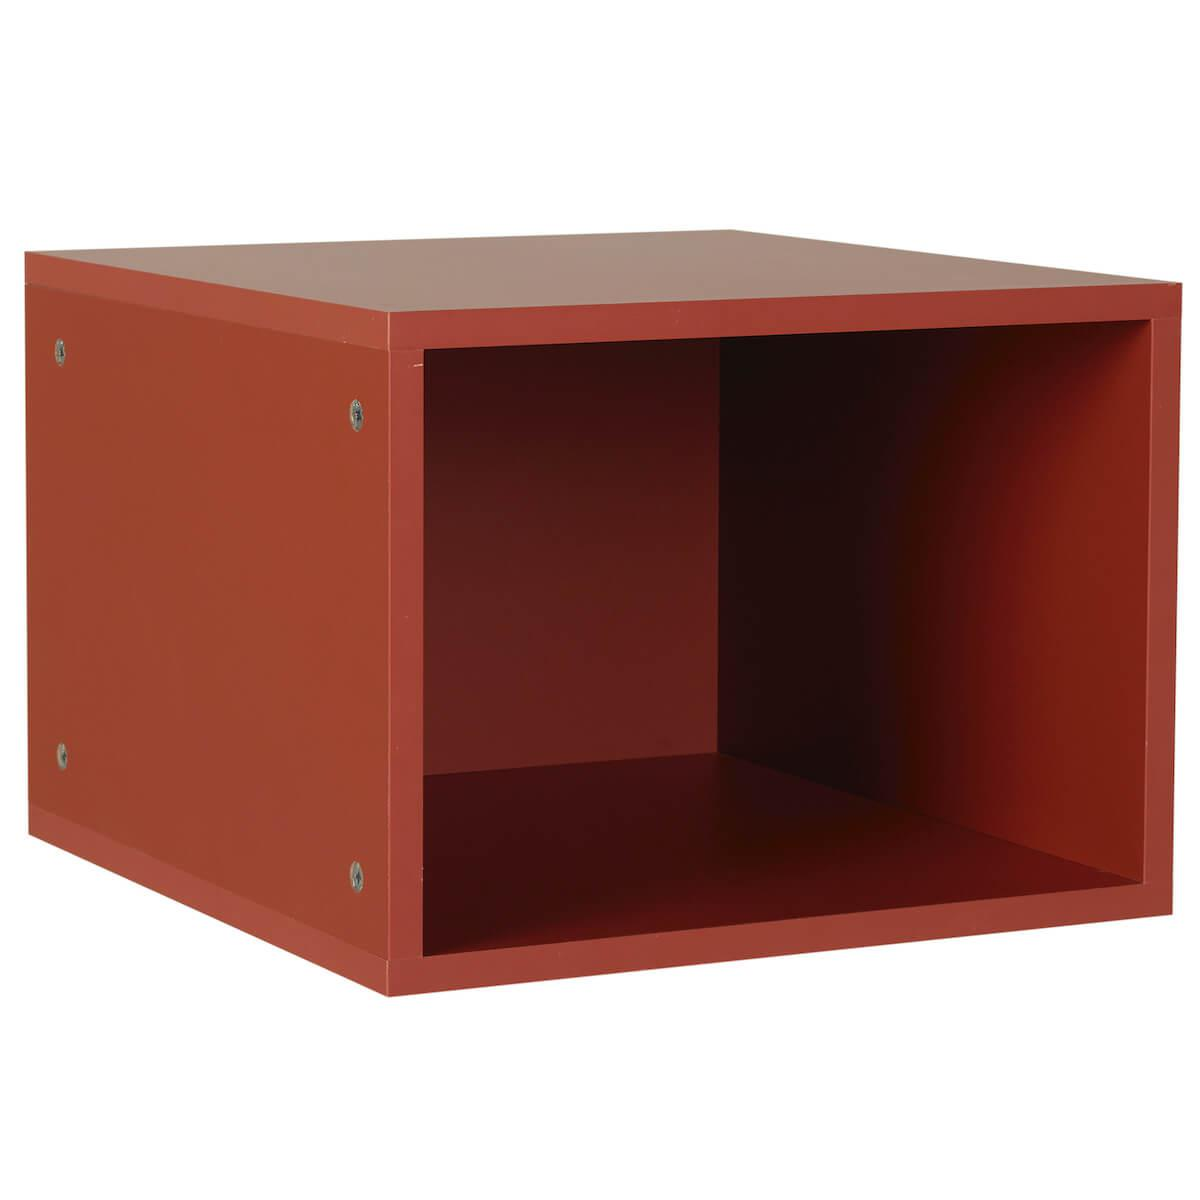 Cubo armario COCOON Quax terra